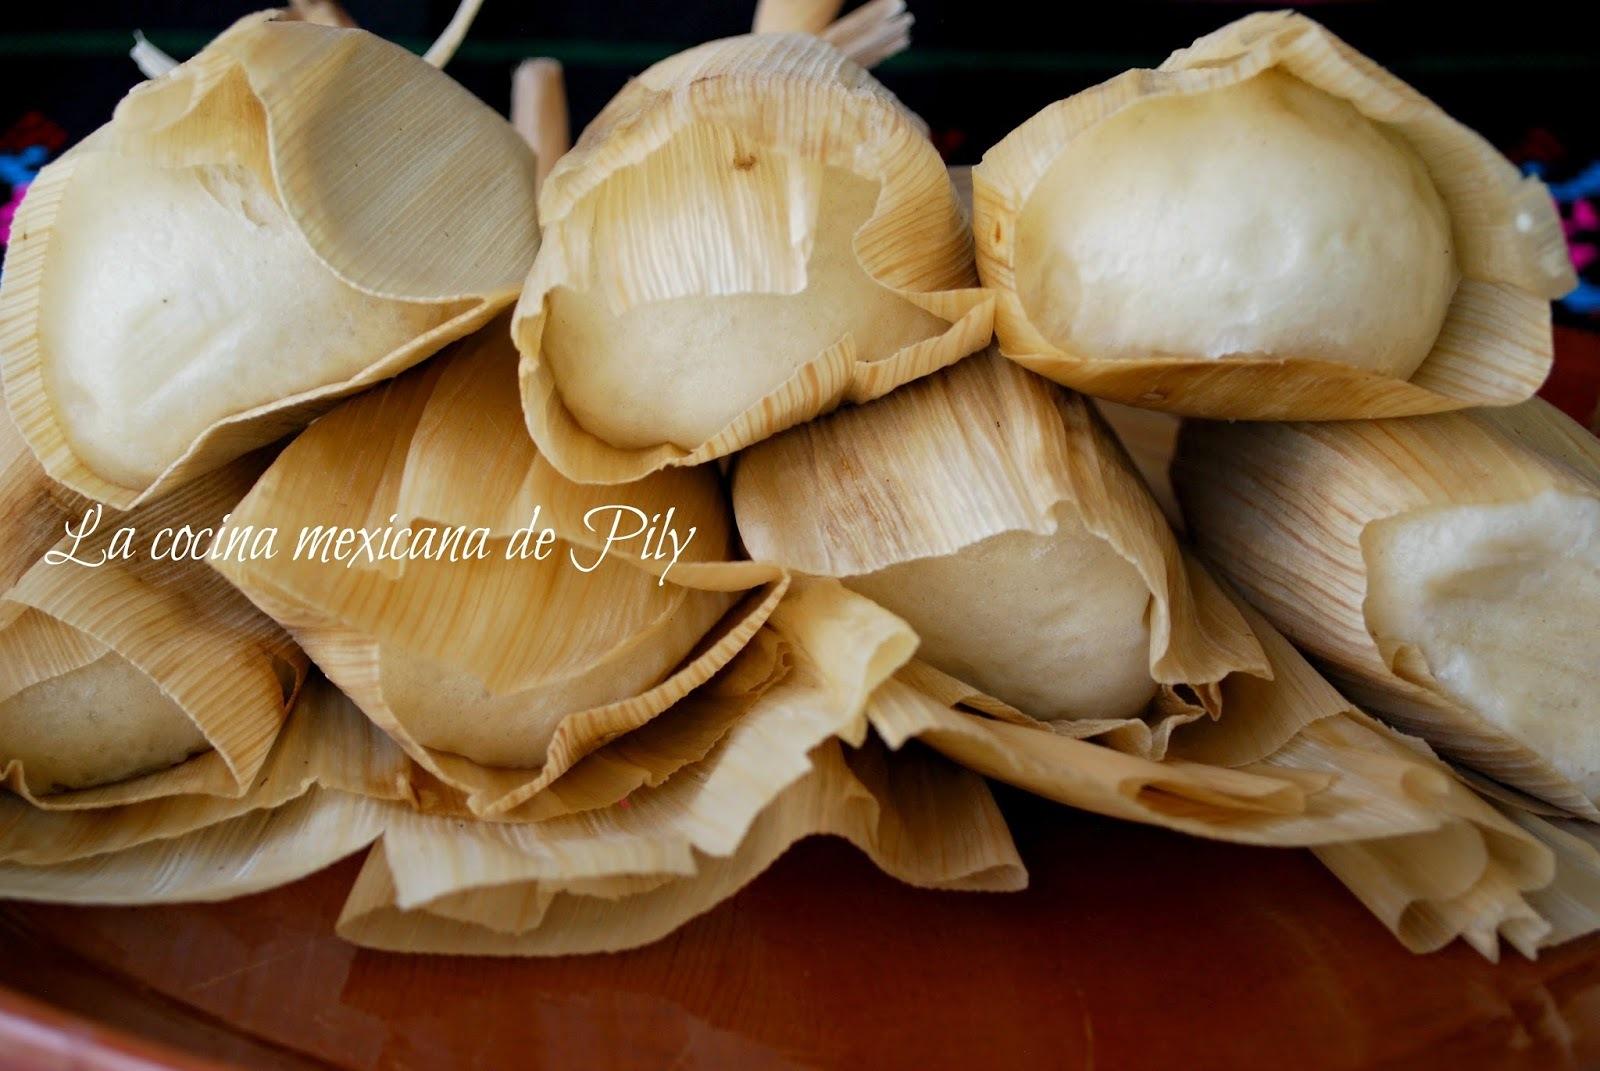 Tamales de harina